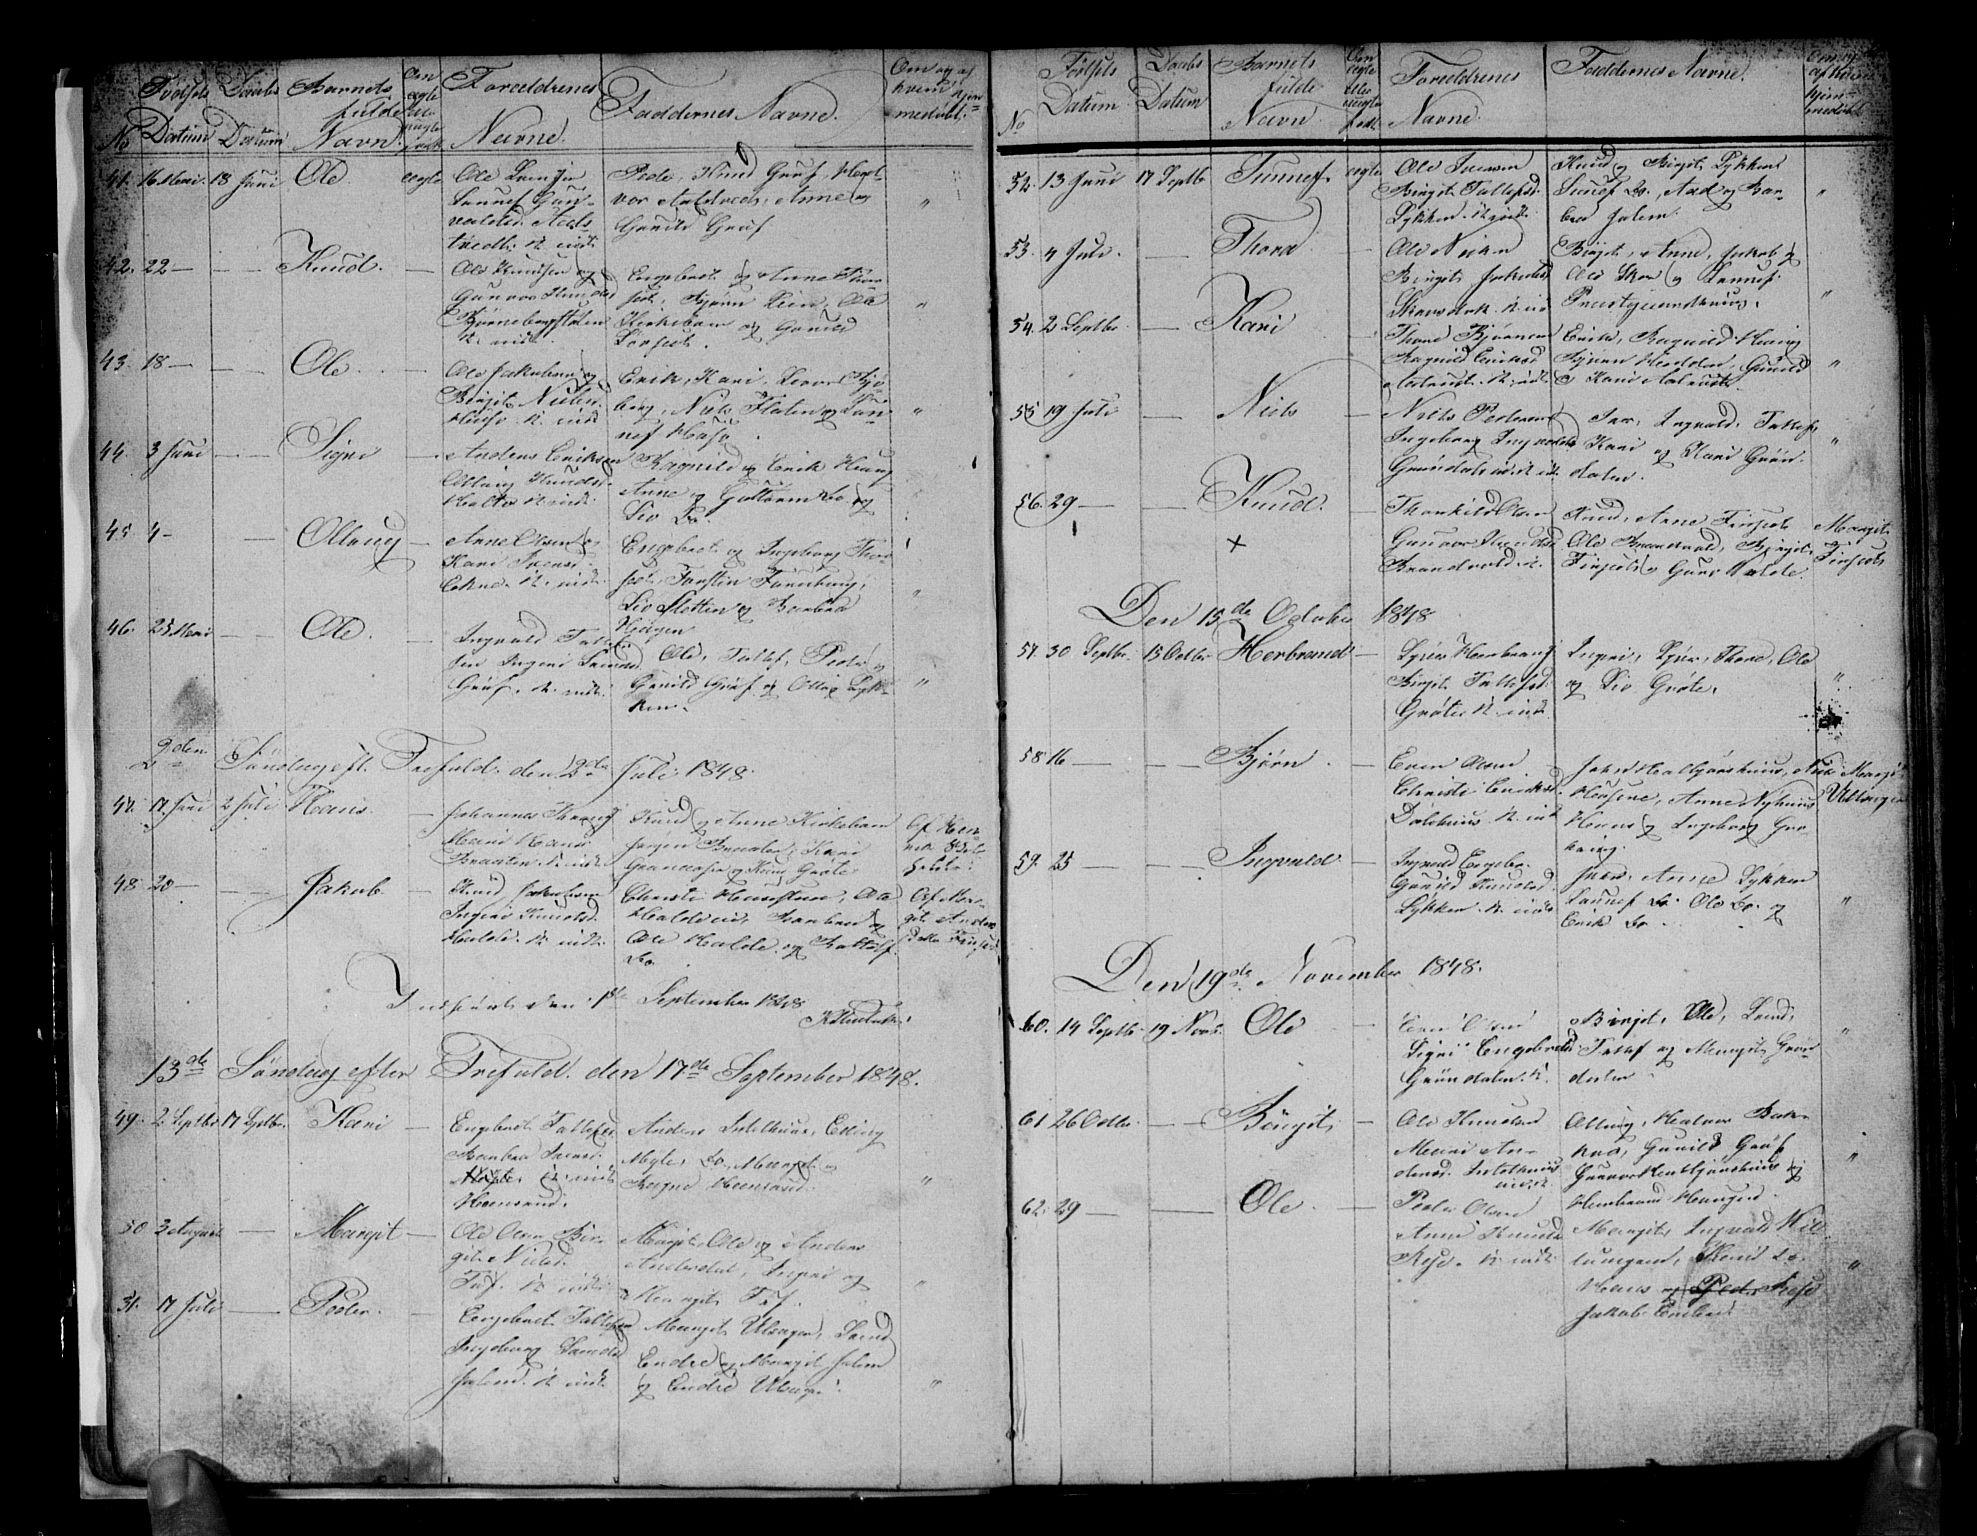 SAKO, Gol kirkebøker, G/Gb/L0003: Klokkerbok nr. II 3, 1844-1858, s. 24-25